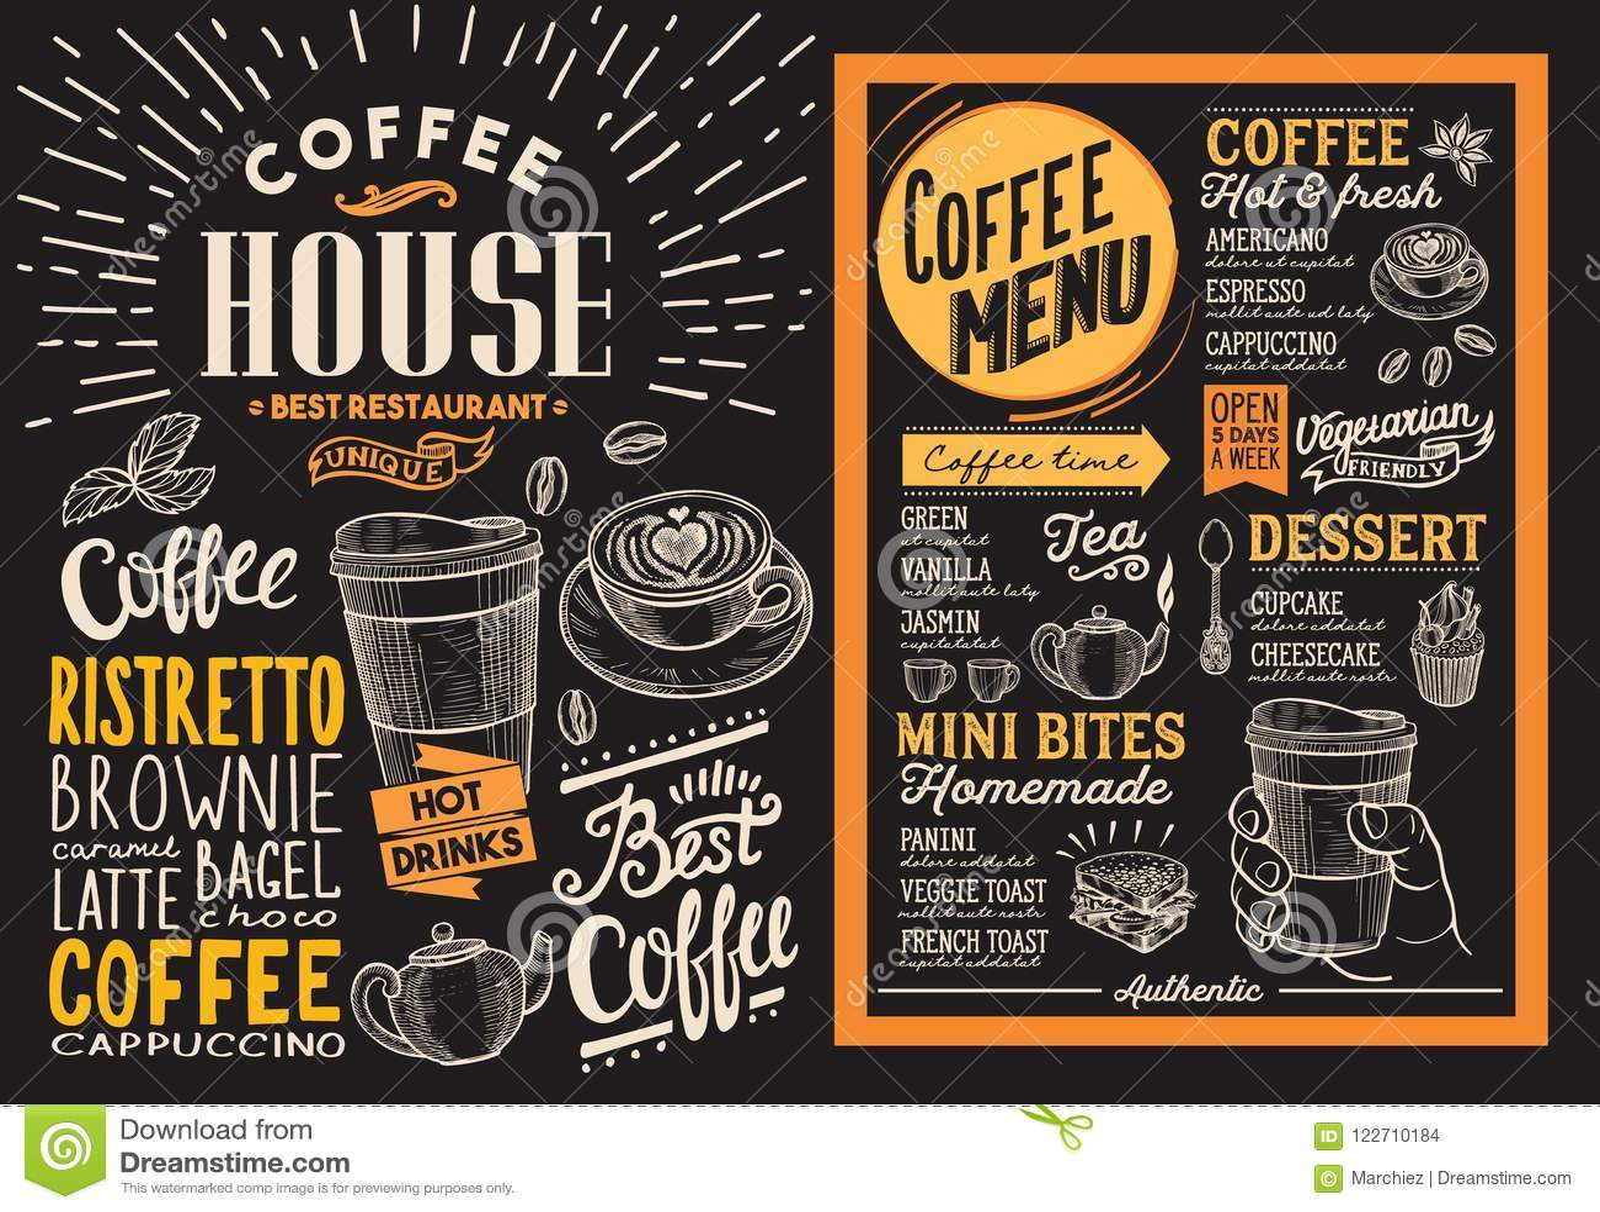 coffee restaurant menu vector drink flyer for bar and cafe des